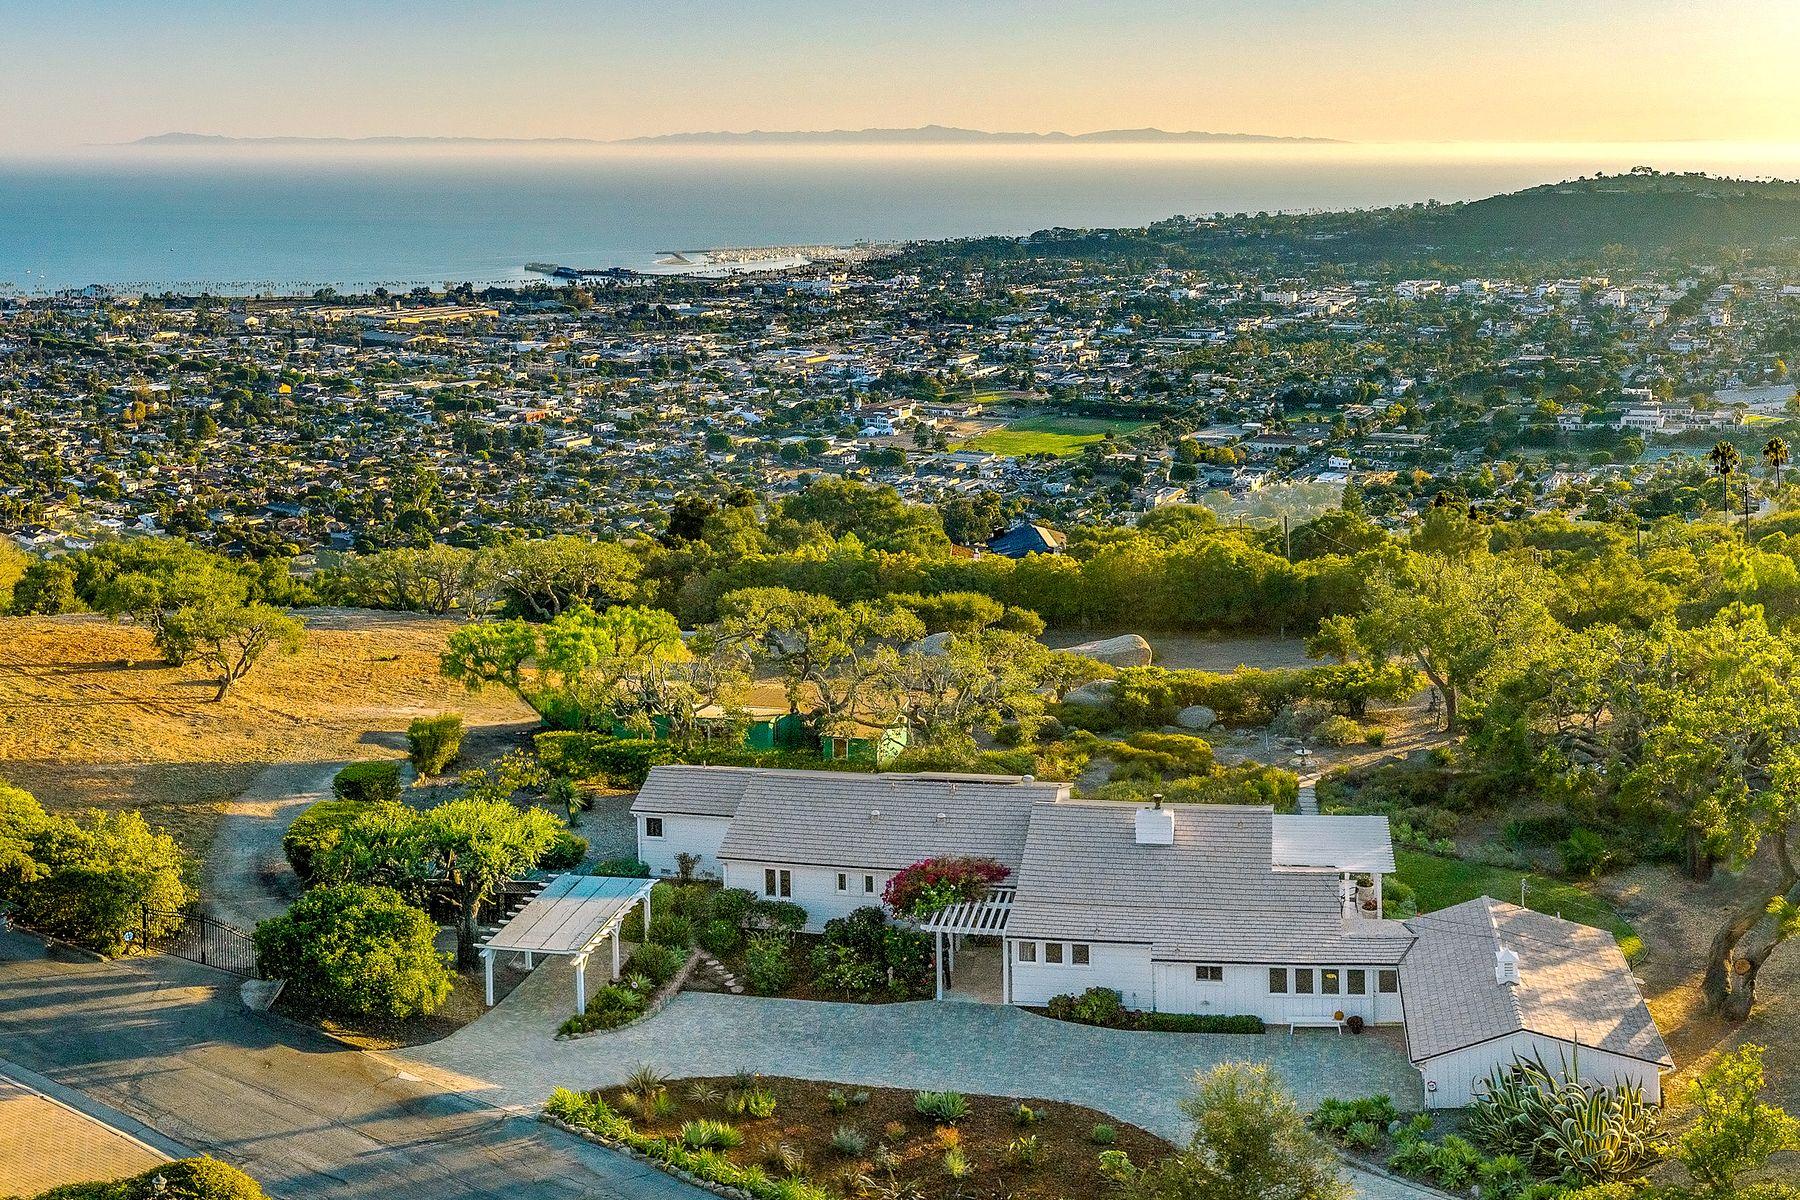 Single Family Homes for Sale at Upper Riviera Ocean View Legacy Property 1215 High Ridge Lane Santa Barbara, California 93103 United States